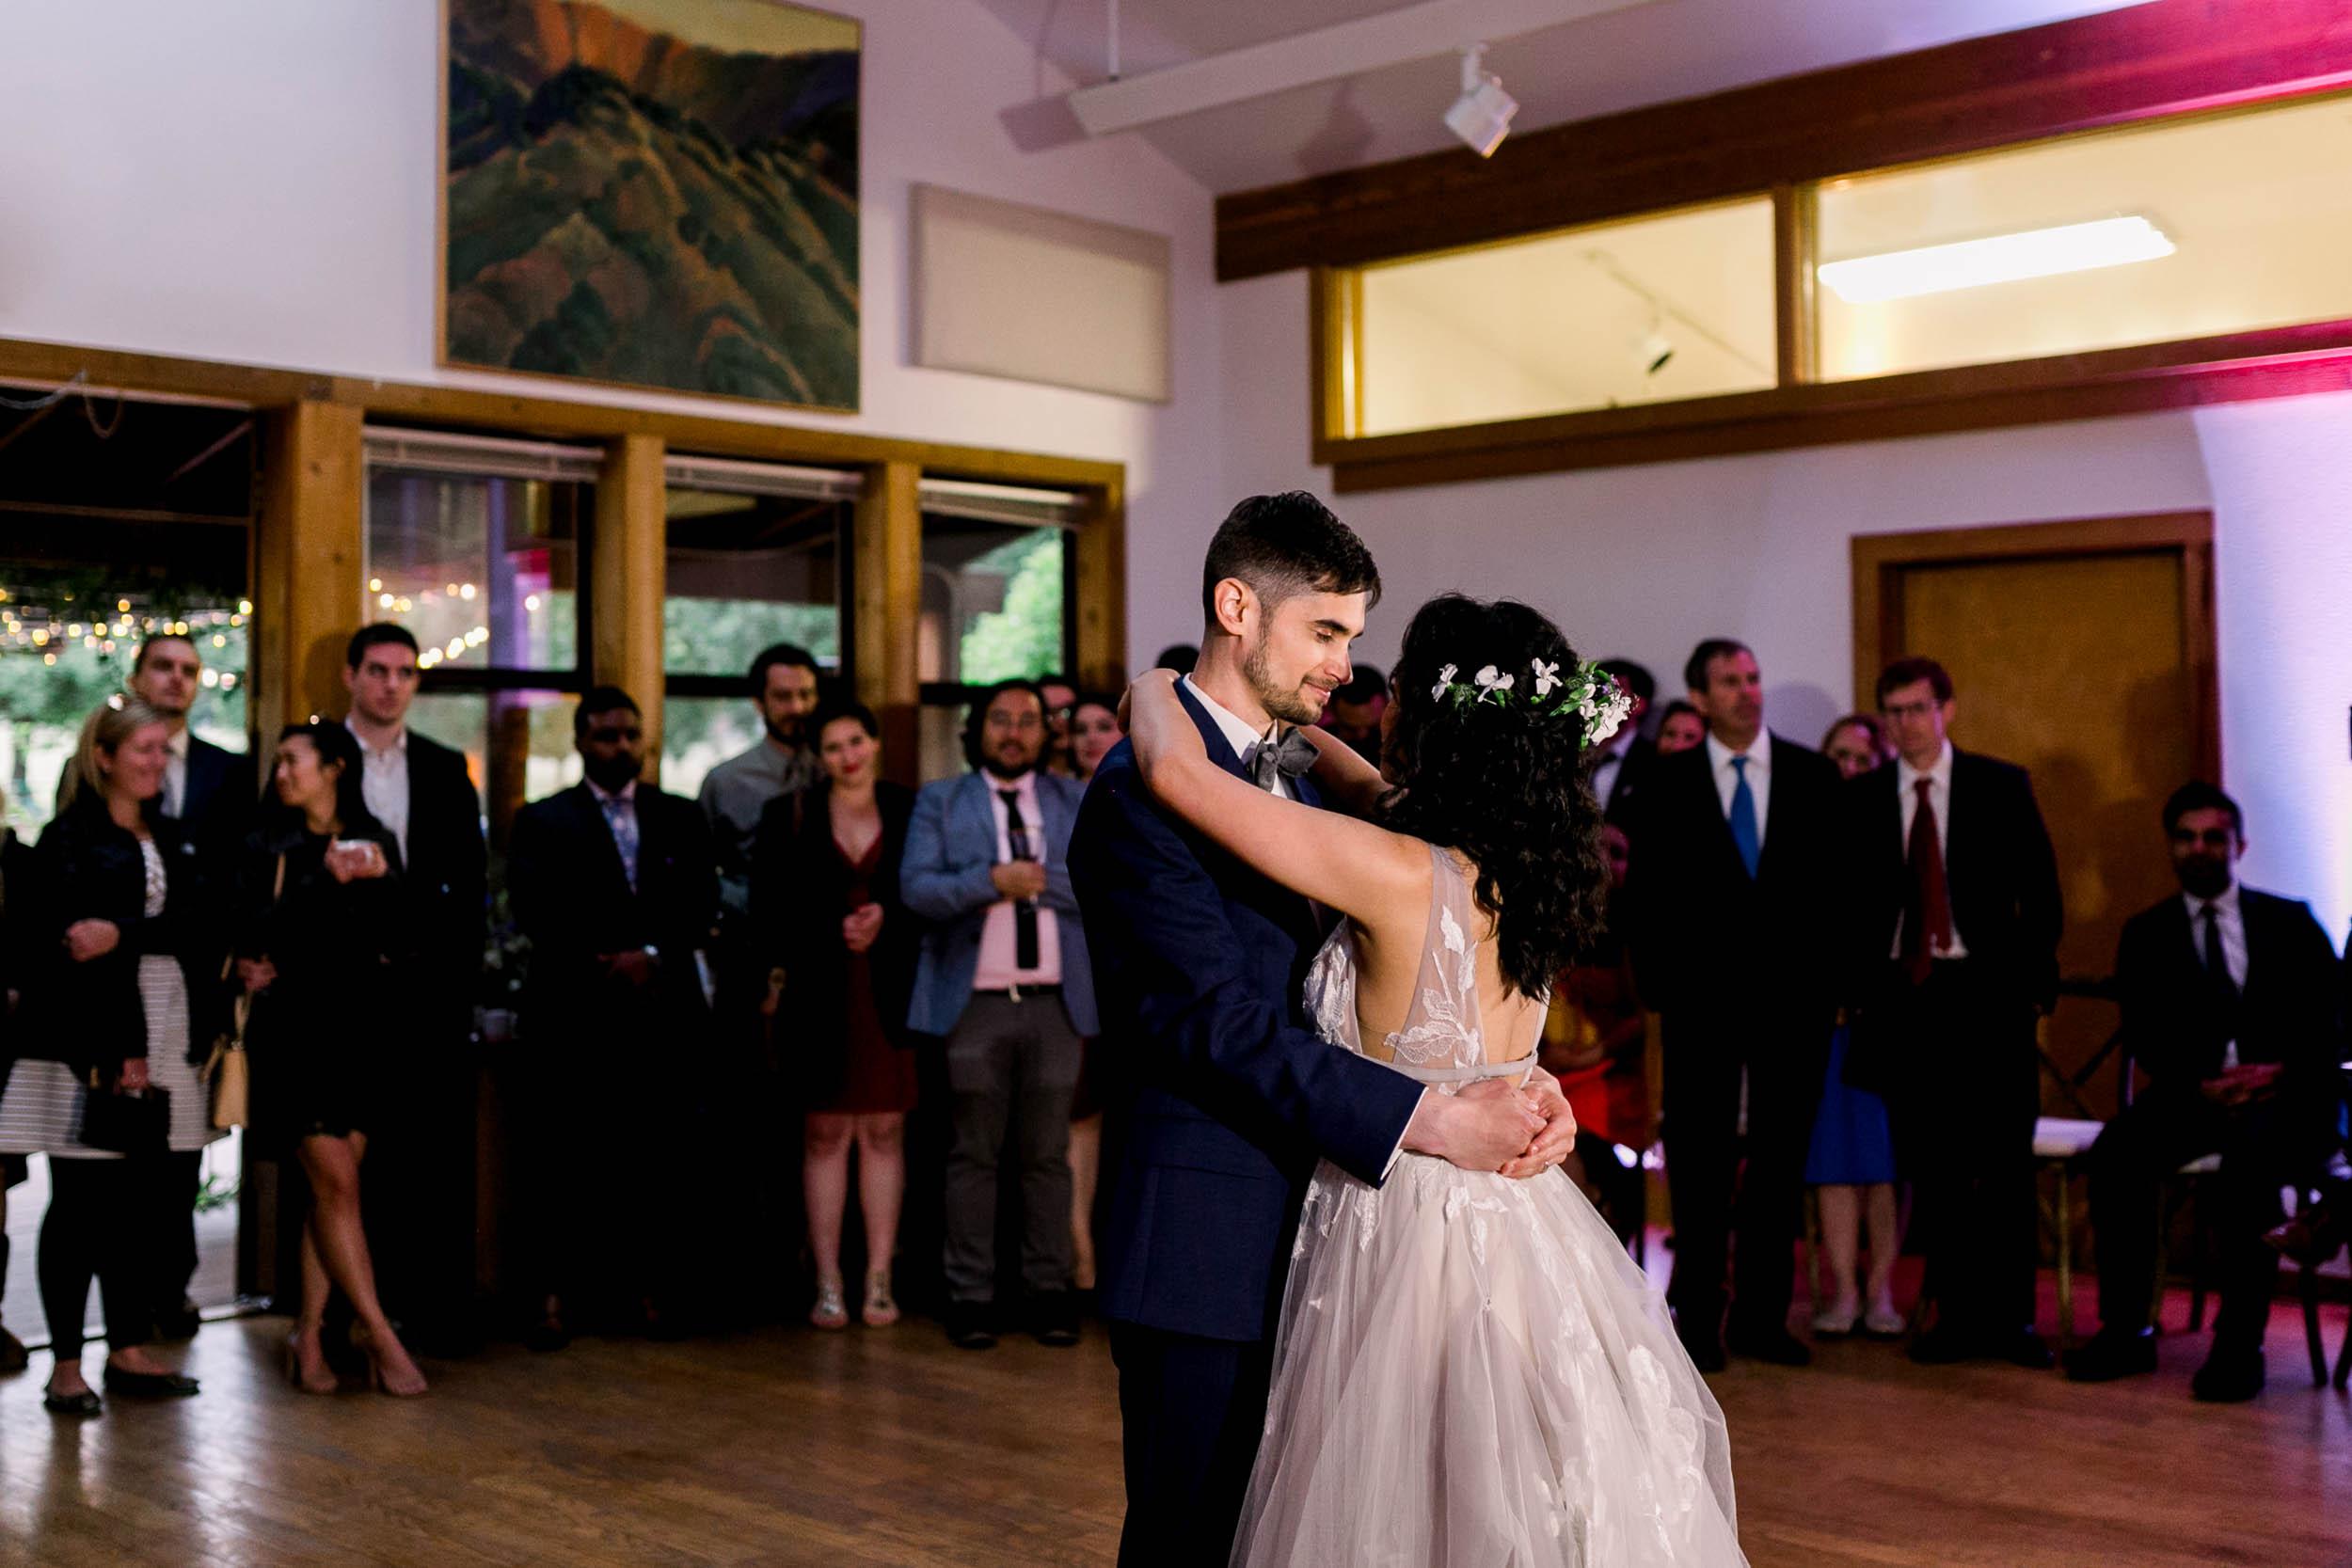 052519_B+S_Hidden Villa Wedding_Buena Lane Photography_052519_1013CY.jpg